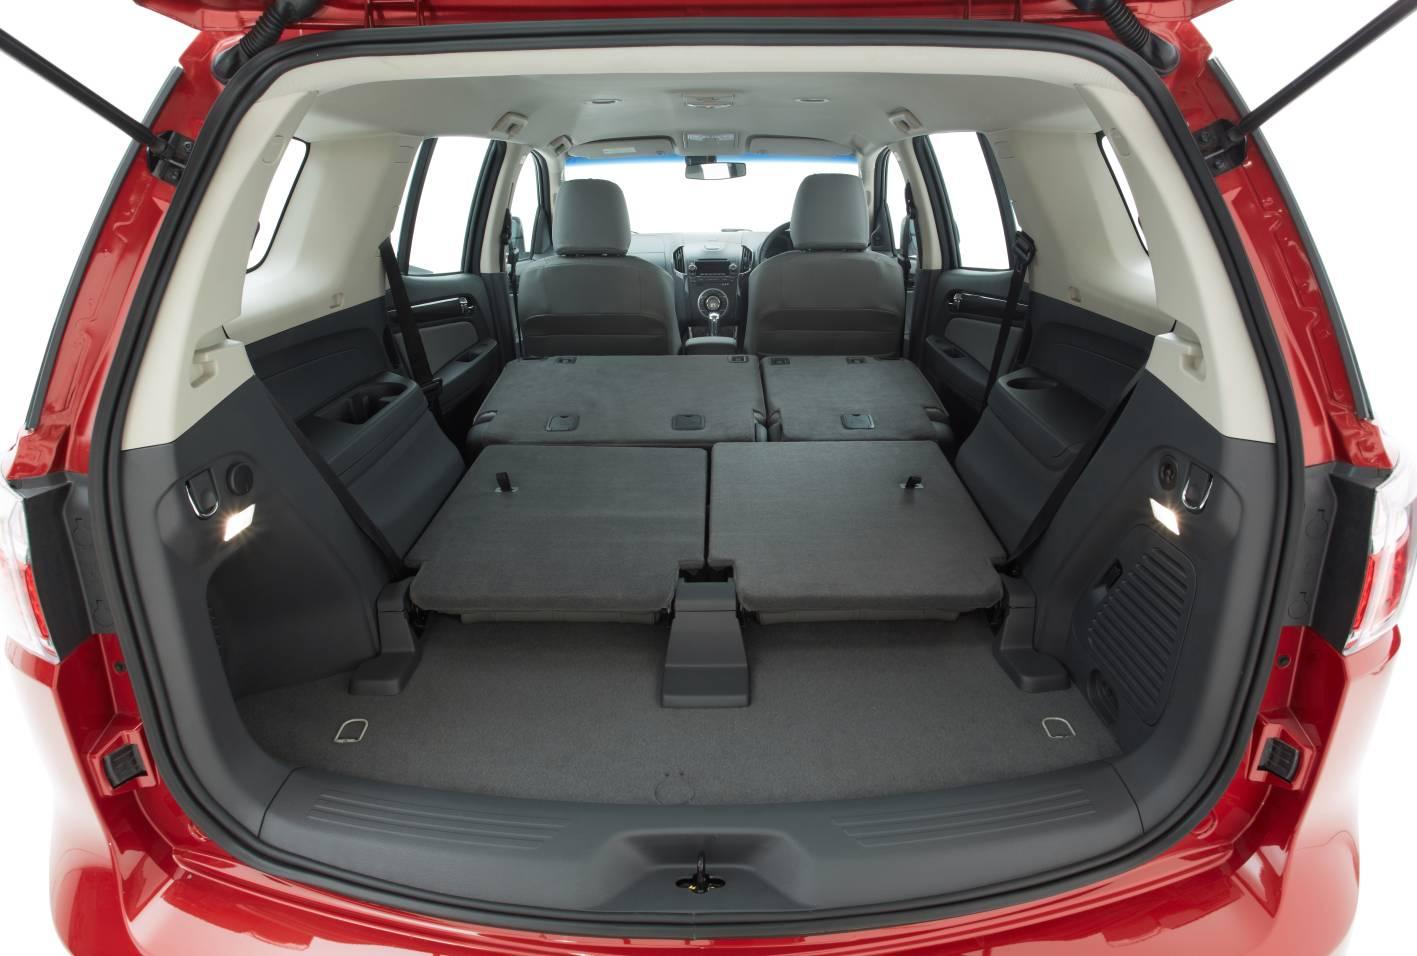 Holden Colorado 7 revealed - photos | CarAdvice